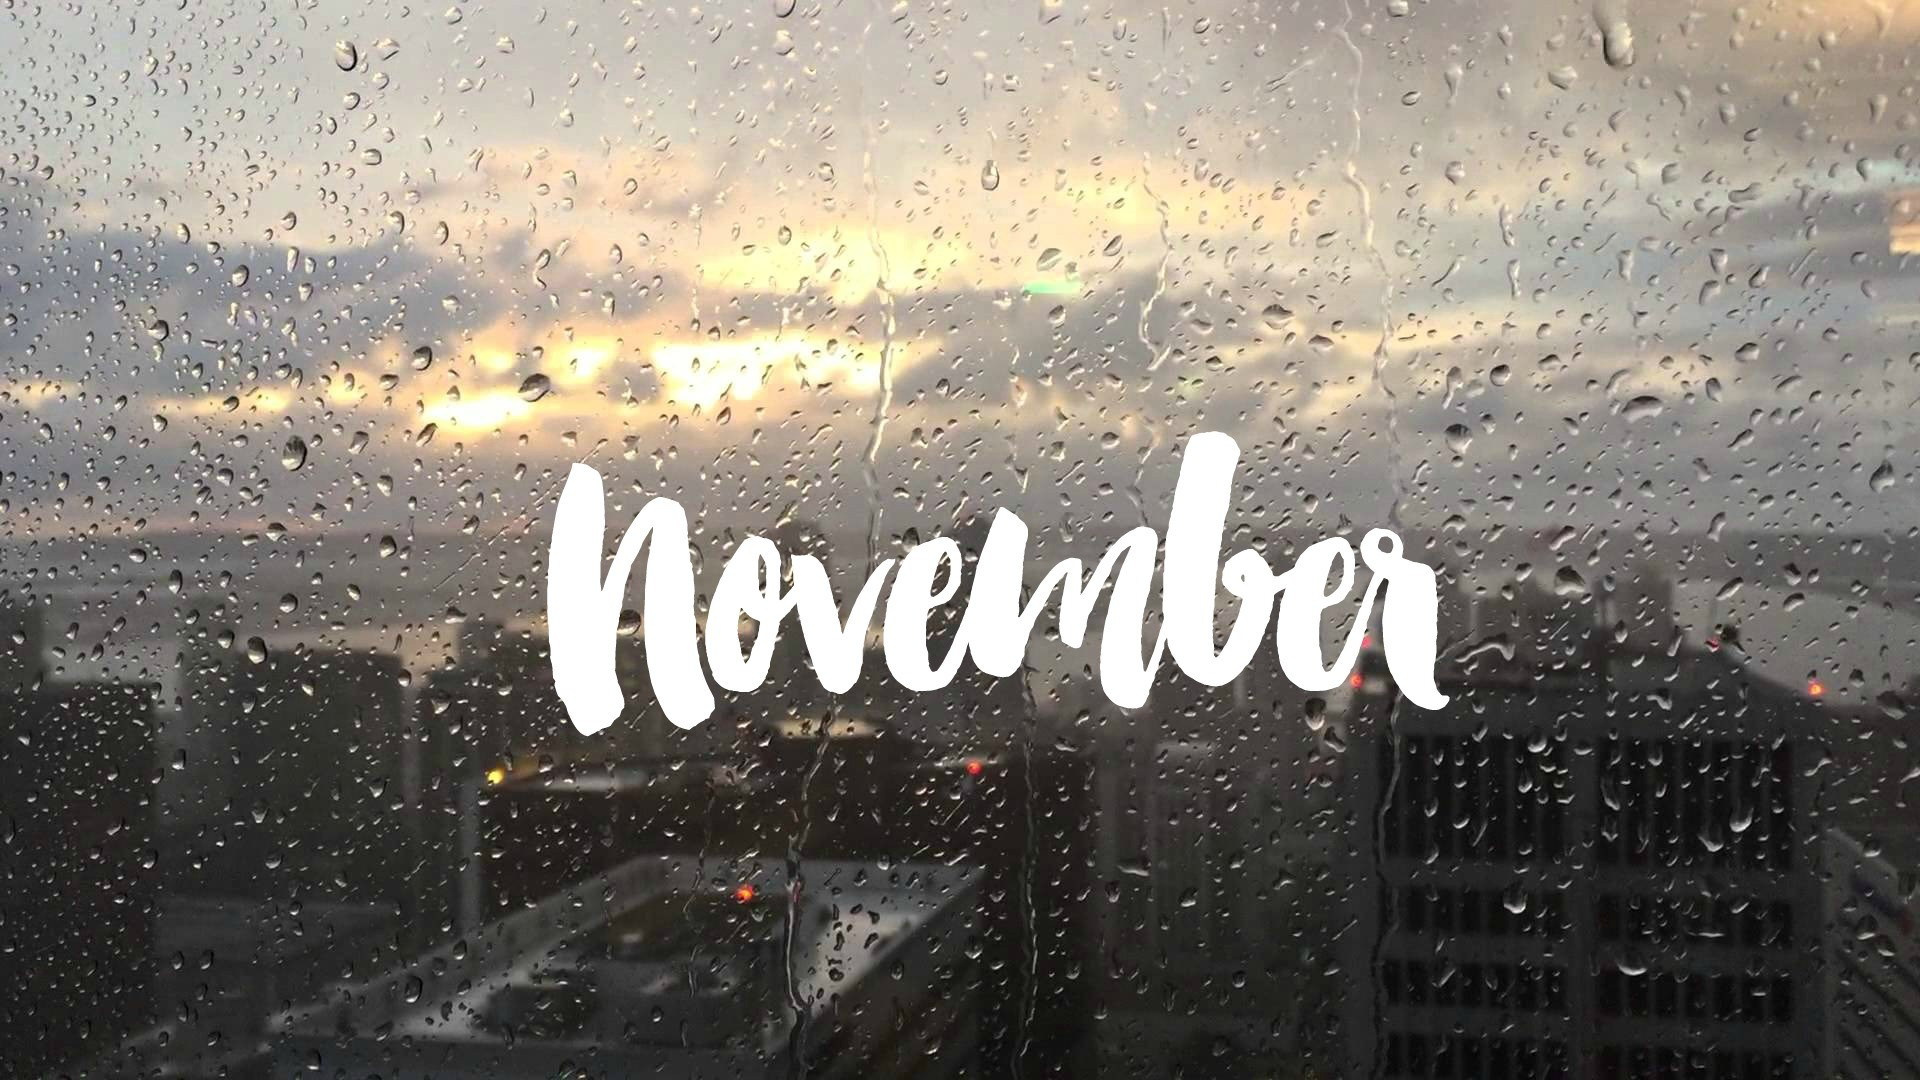 N O V E M B E R november, november quote, image, desktop, wallpaper, screen  , phone,